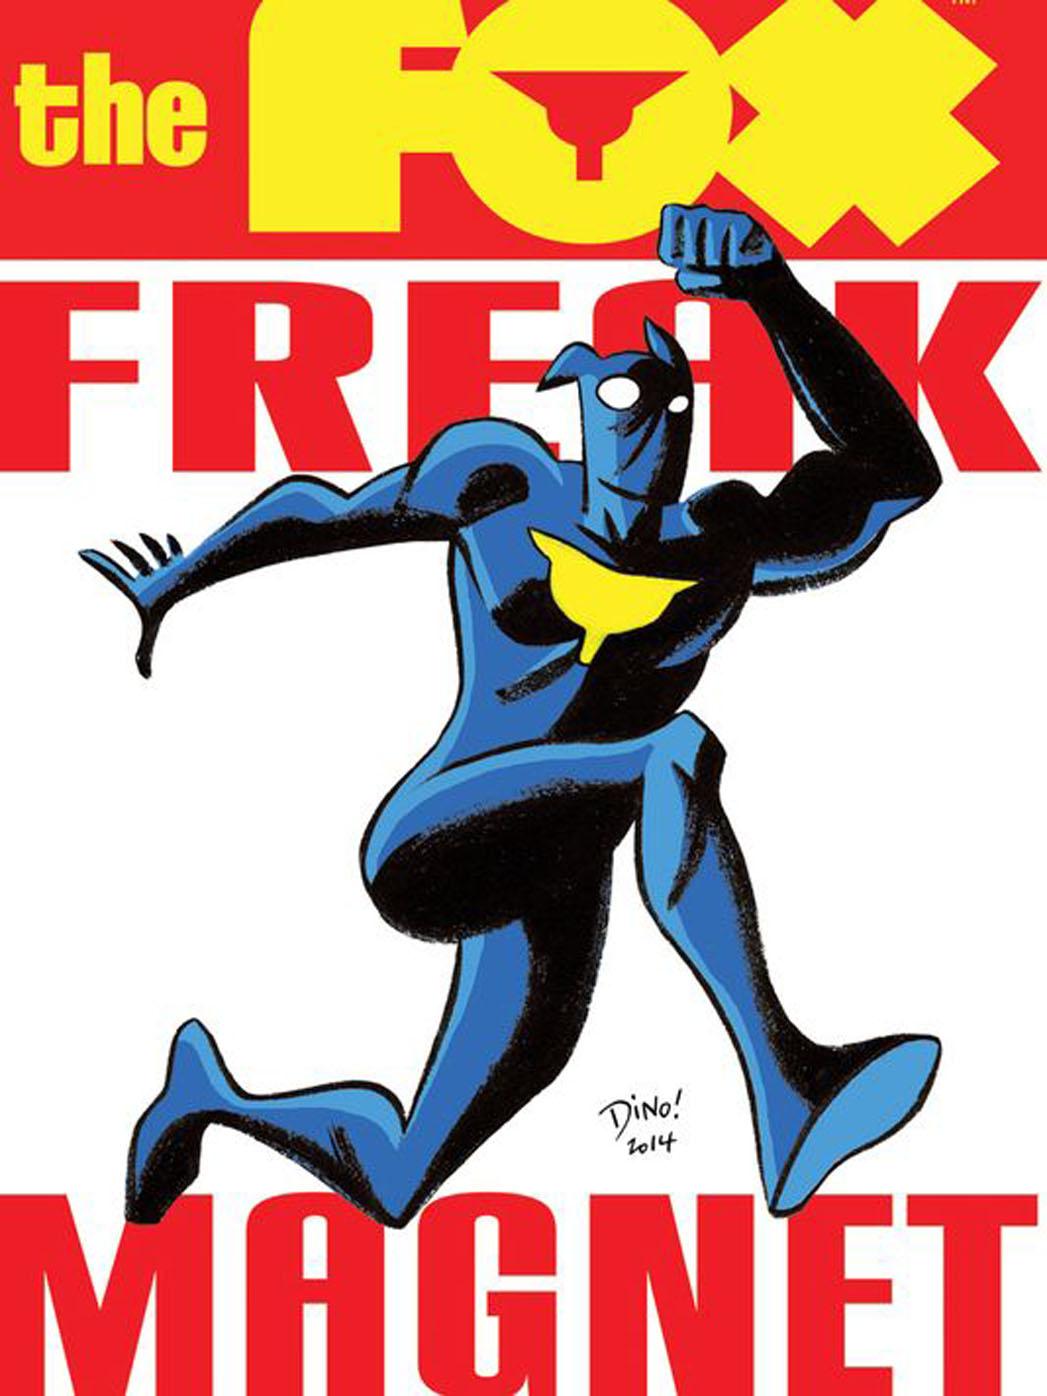 Fox Freak Magnet - P 2014